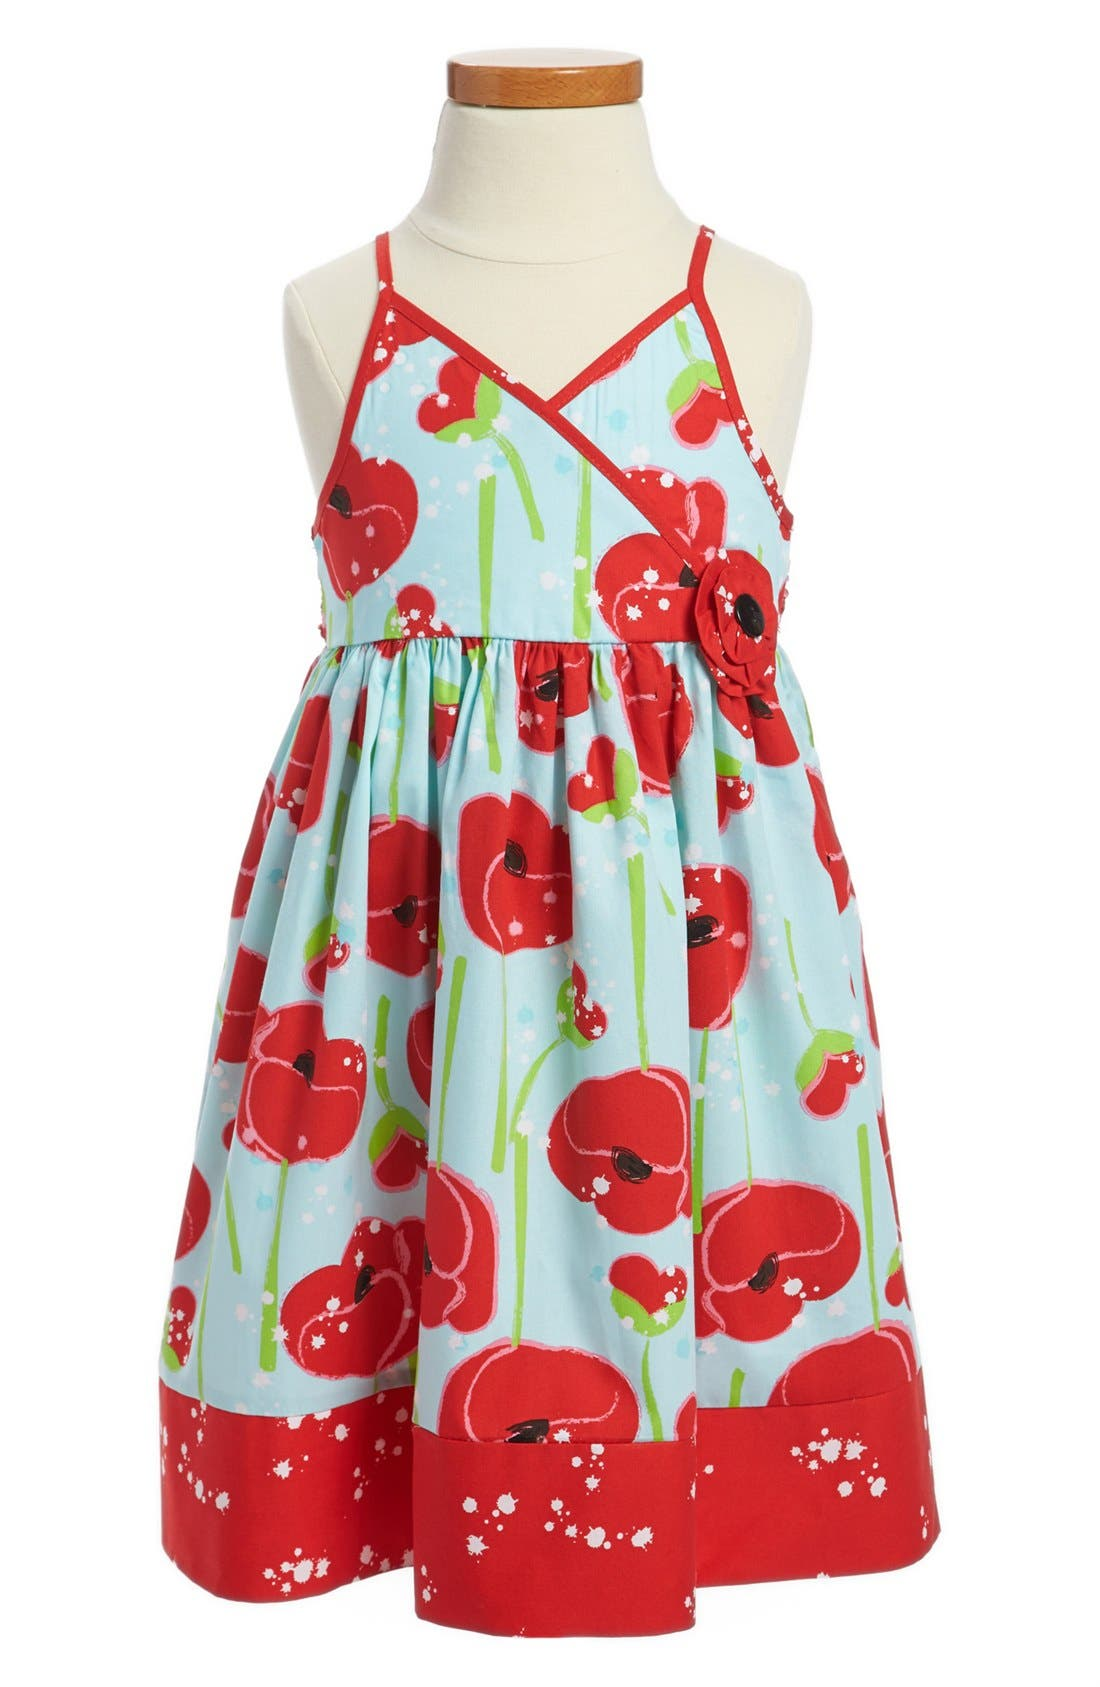 Alternate Image 1 Selected - Marmelatta Pansy Print Surplice Dress